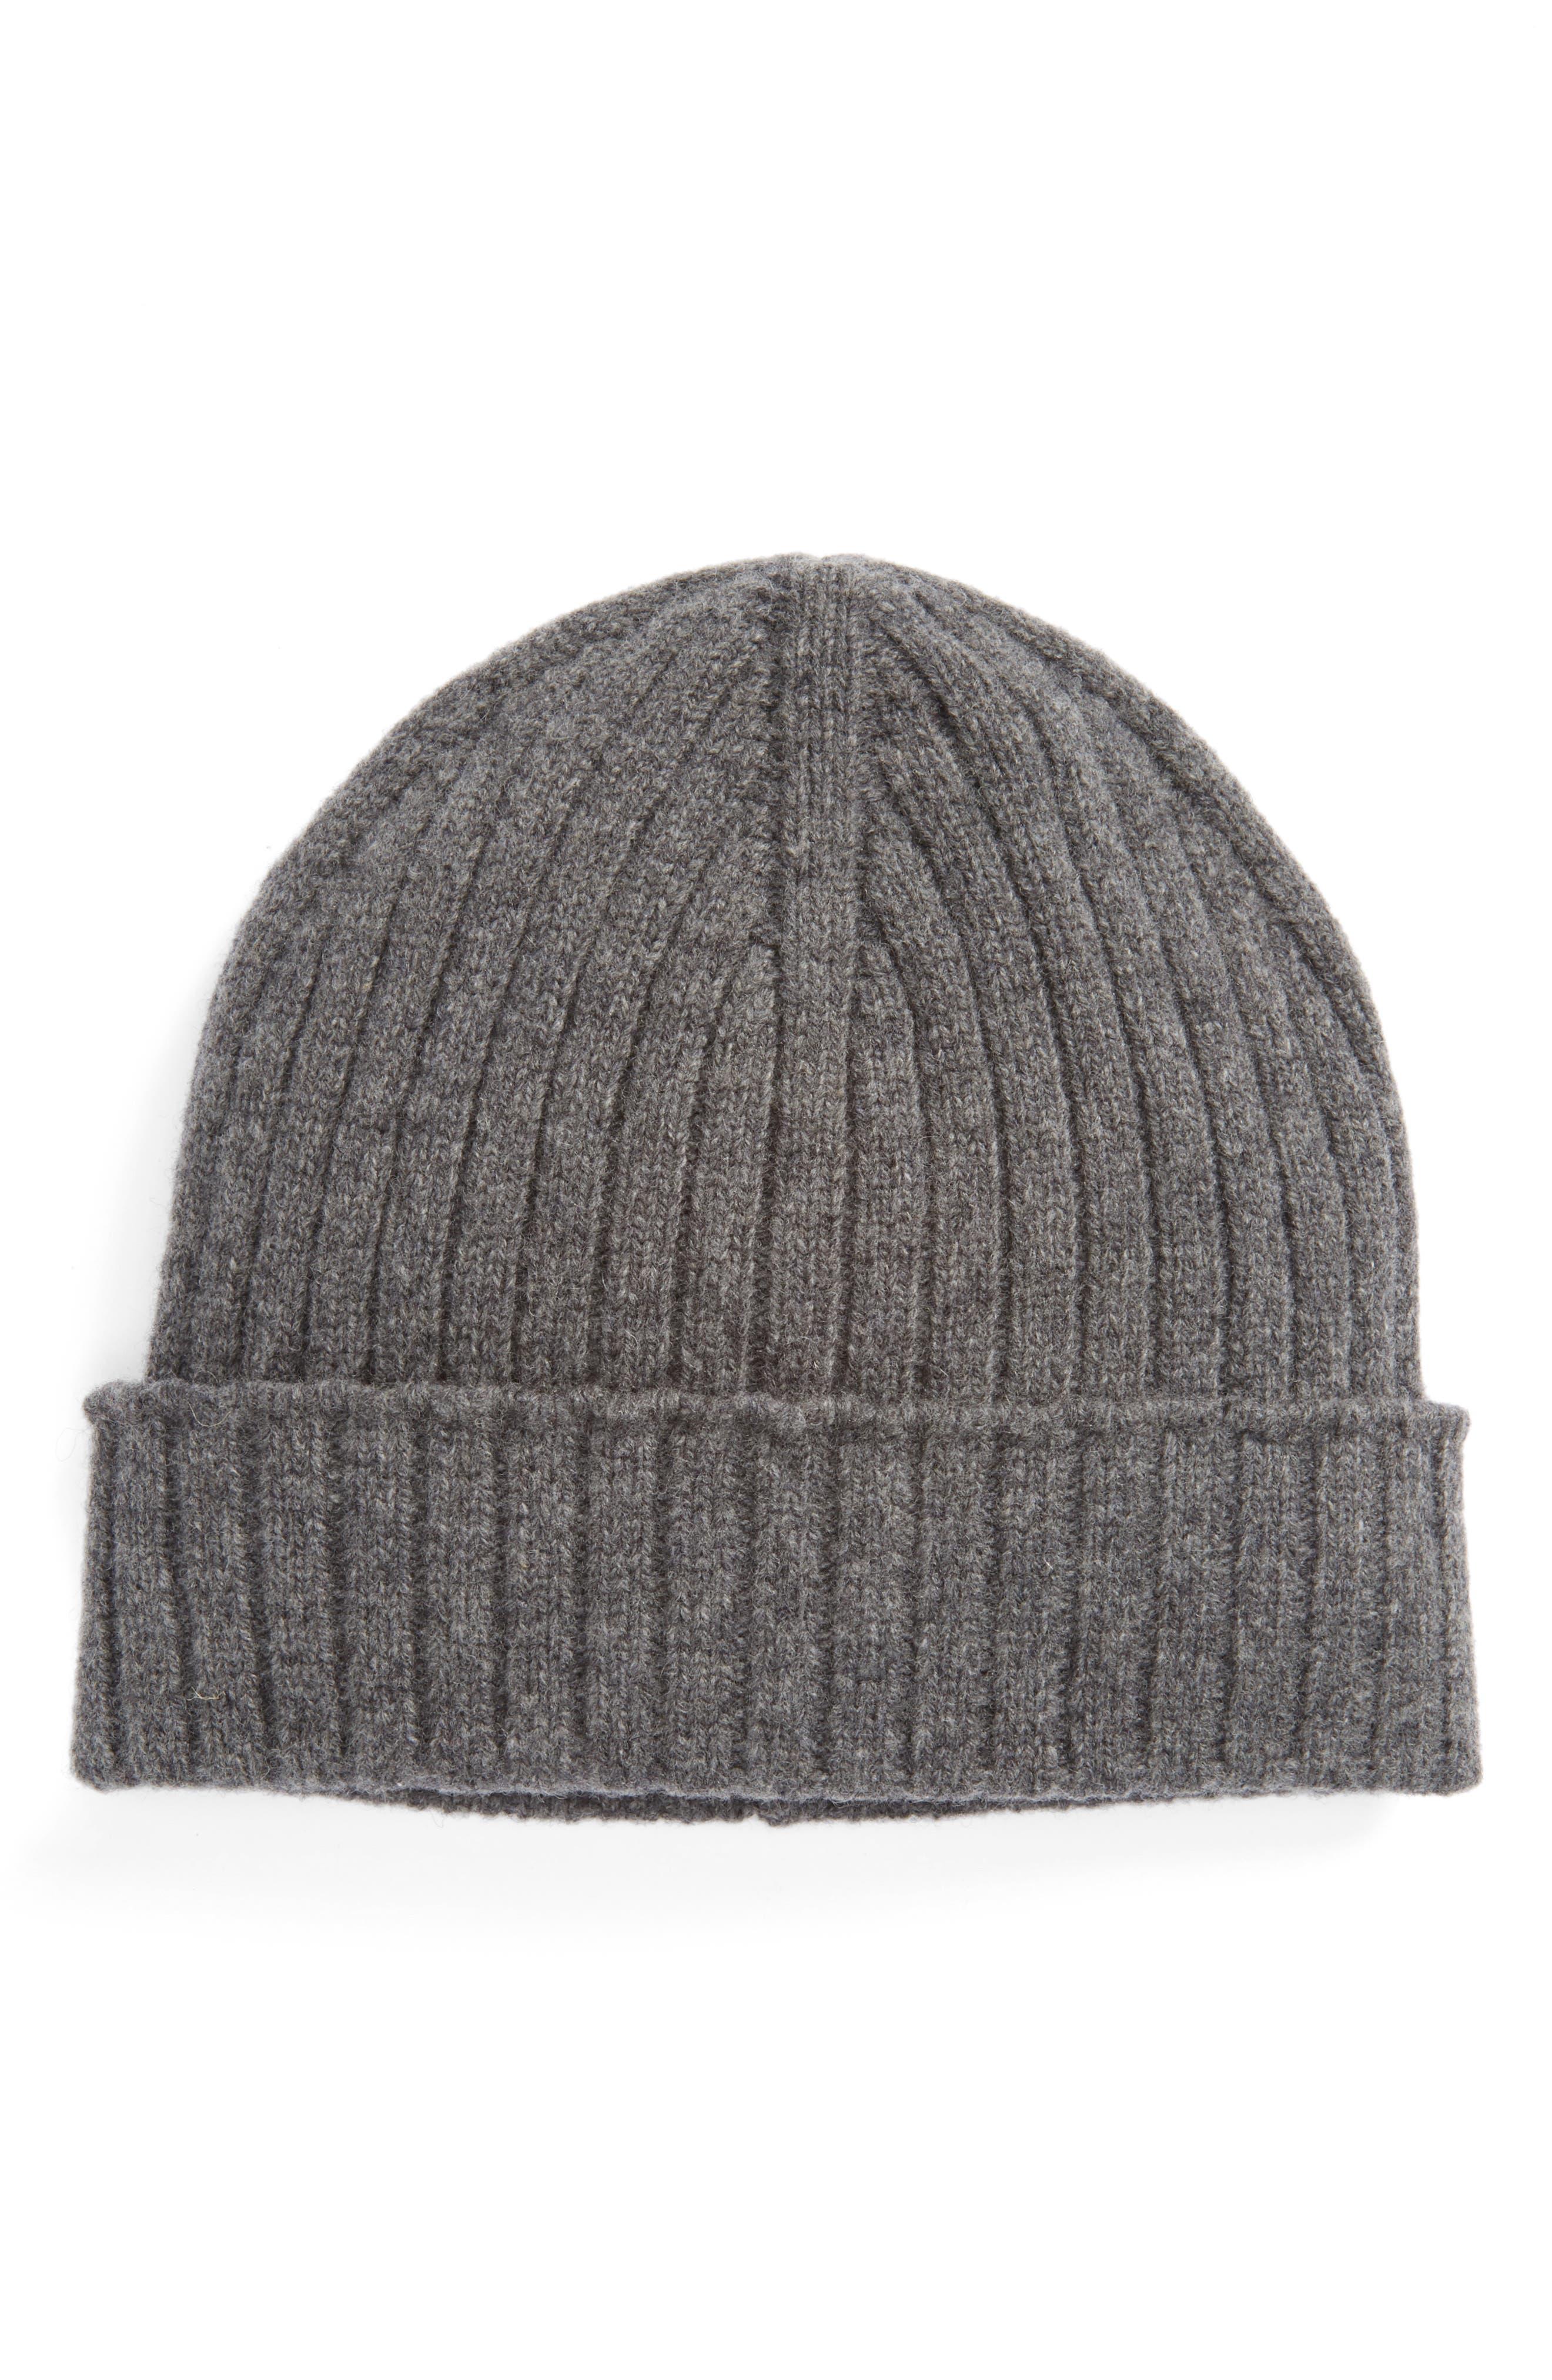 Wool Knit Cap,                             Main thumbnail 1, color,                             063